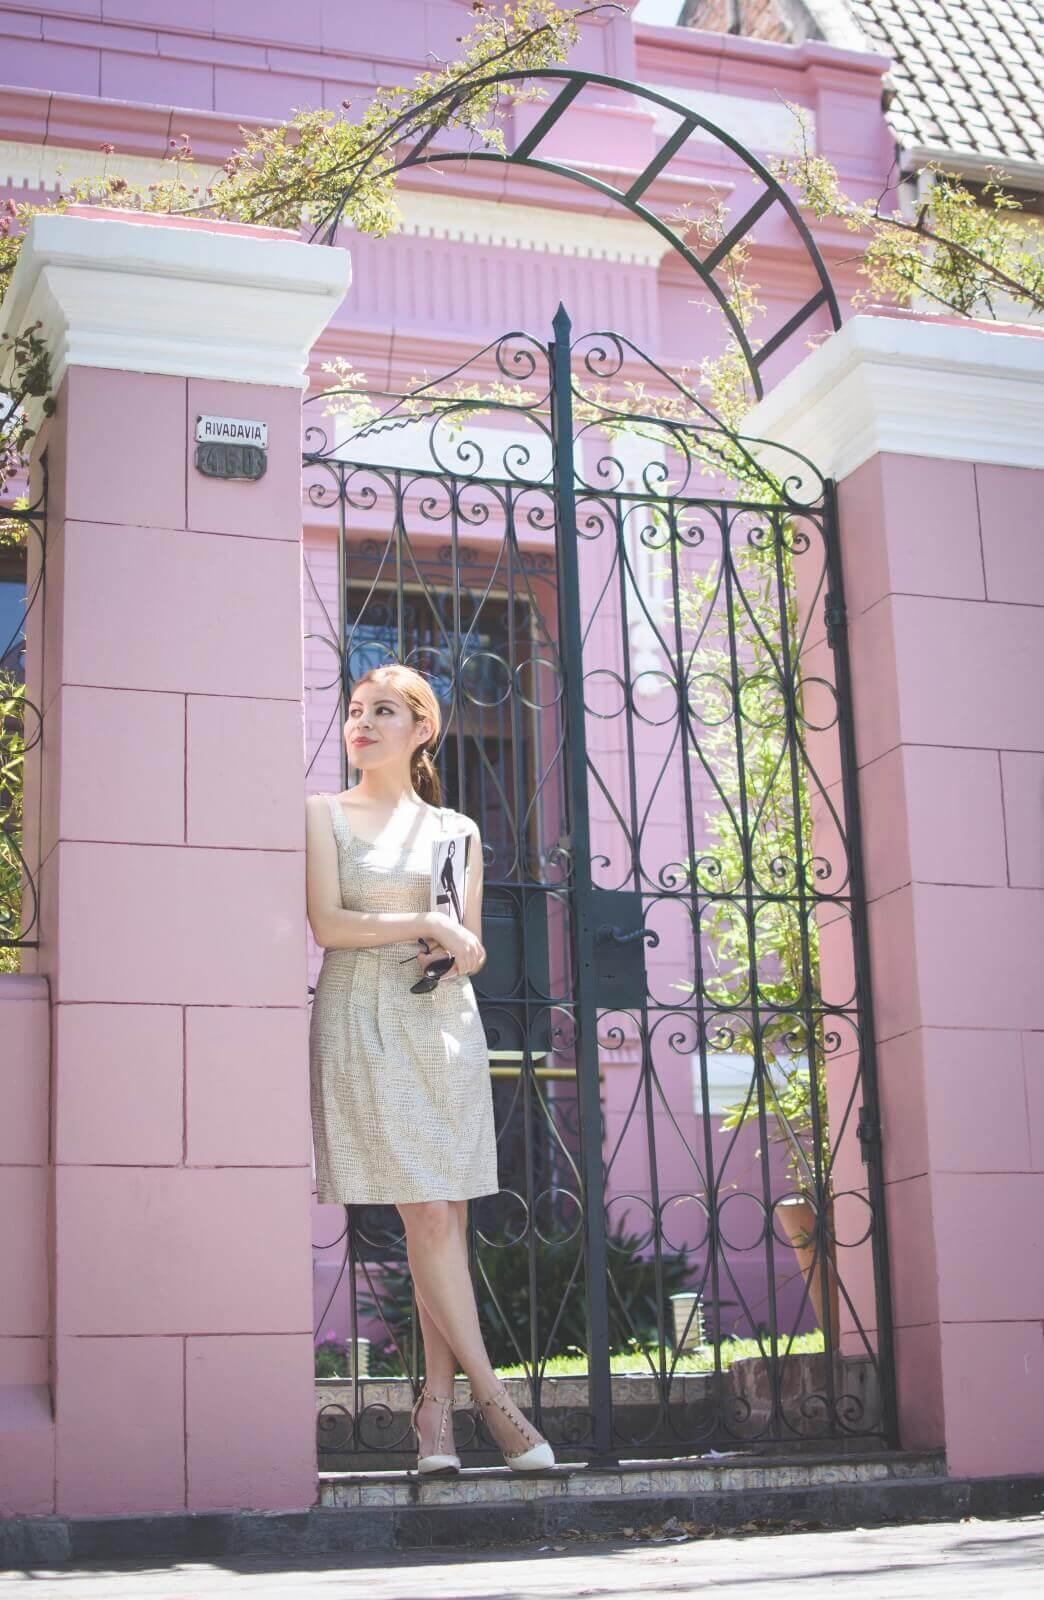 almond-white-dress-sammydress-stilettos-valentino-rockstud-imitation-deborah-ferrero-style-by-deb-ladylike07